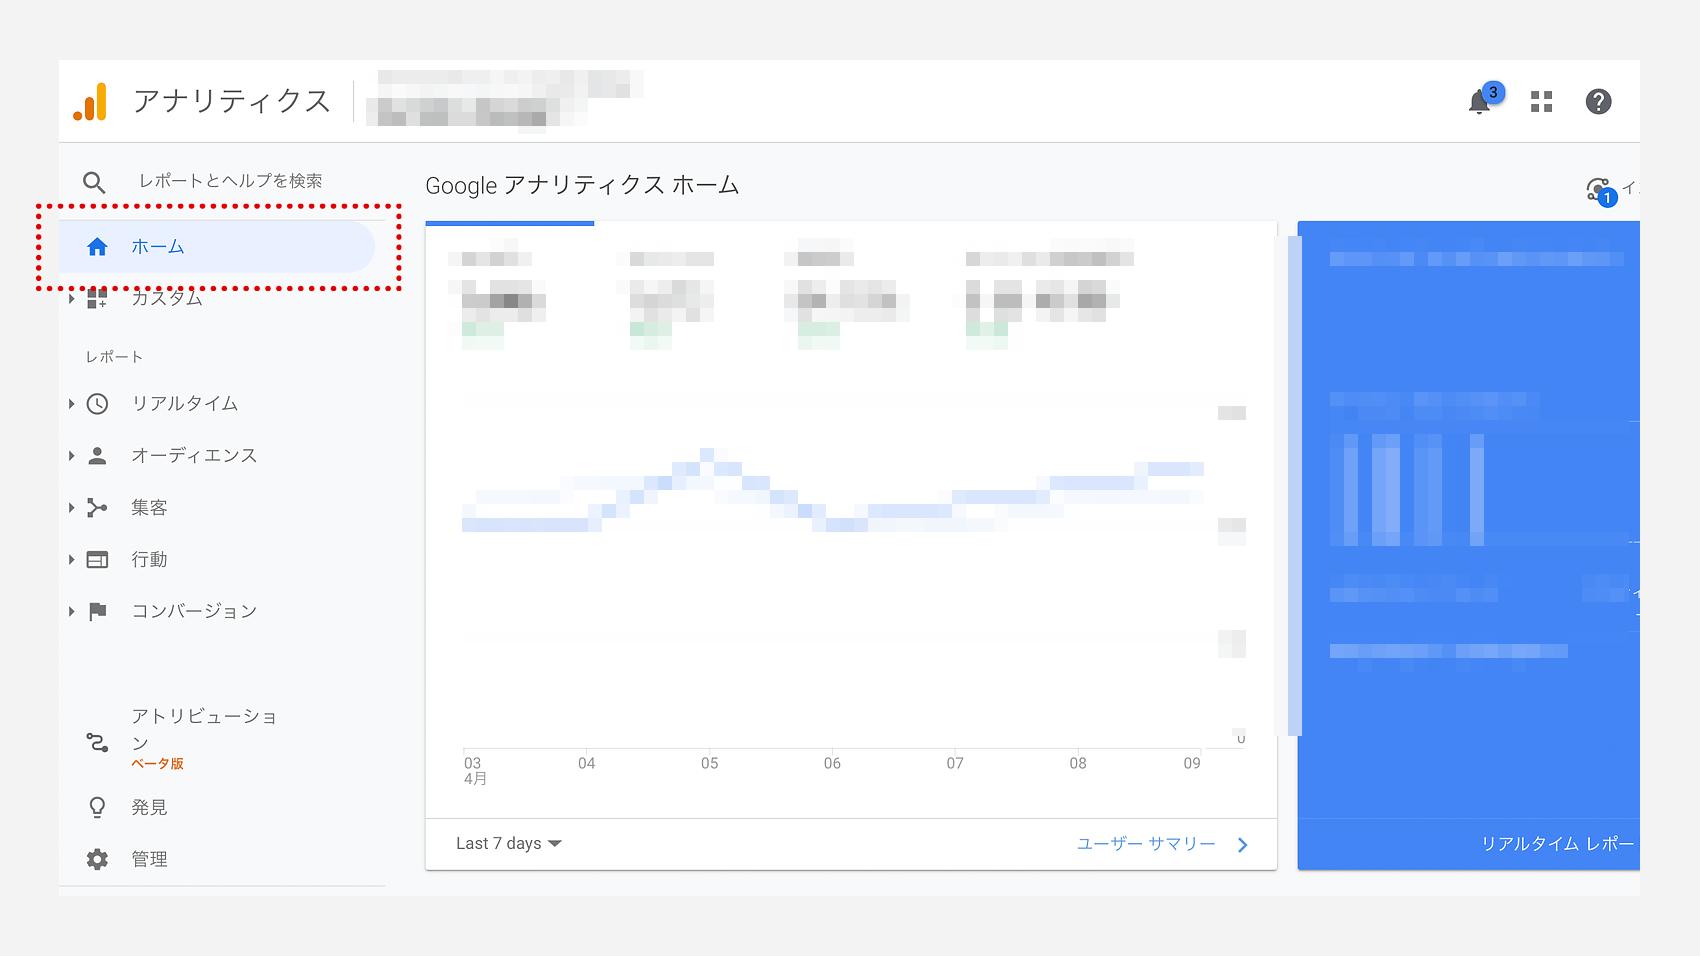 googleアナリティクスのリアルタイム機能